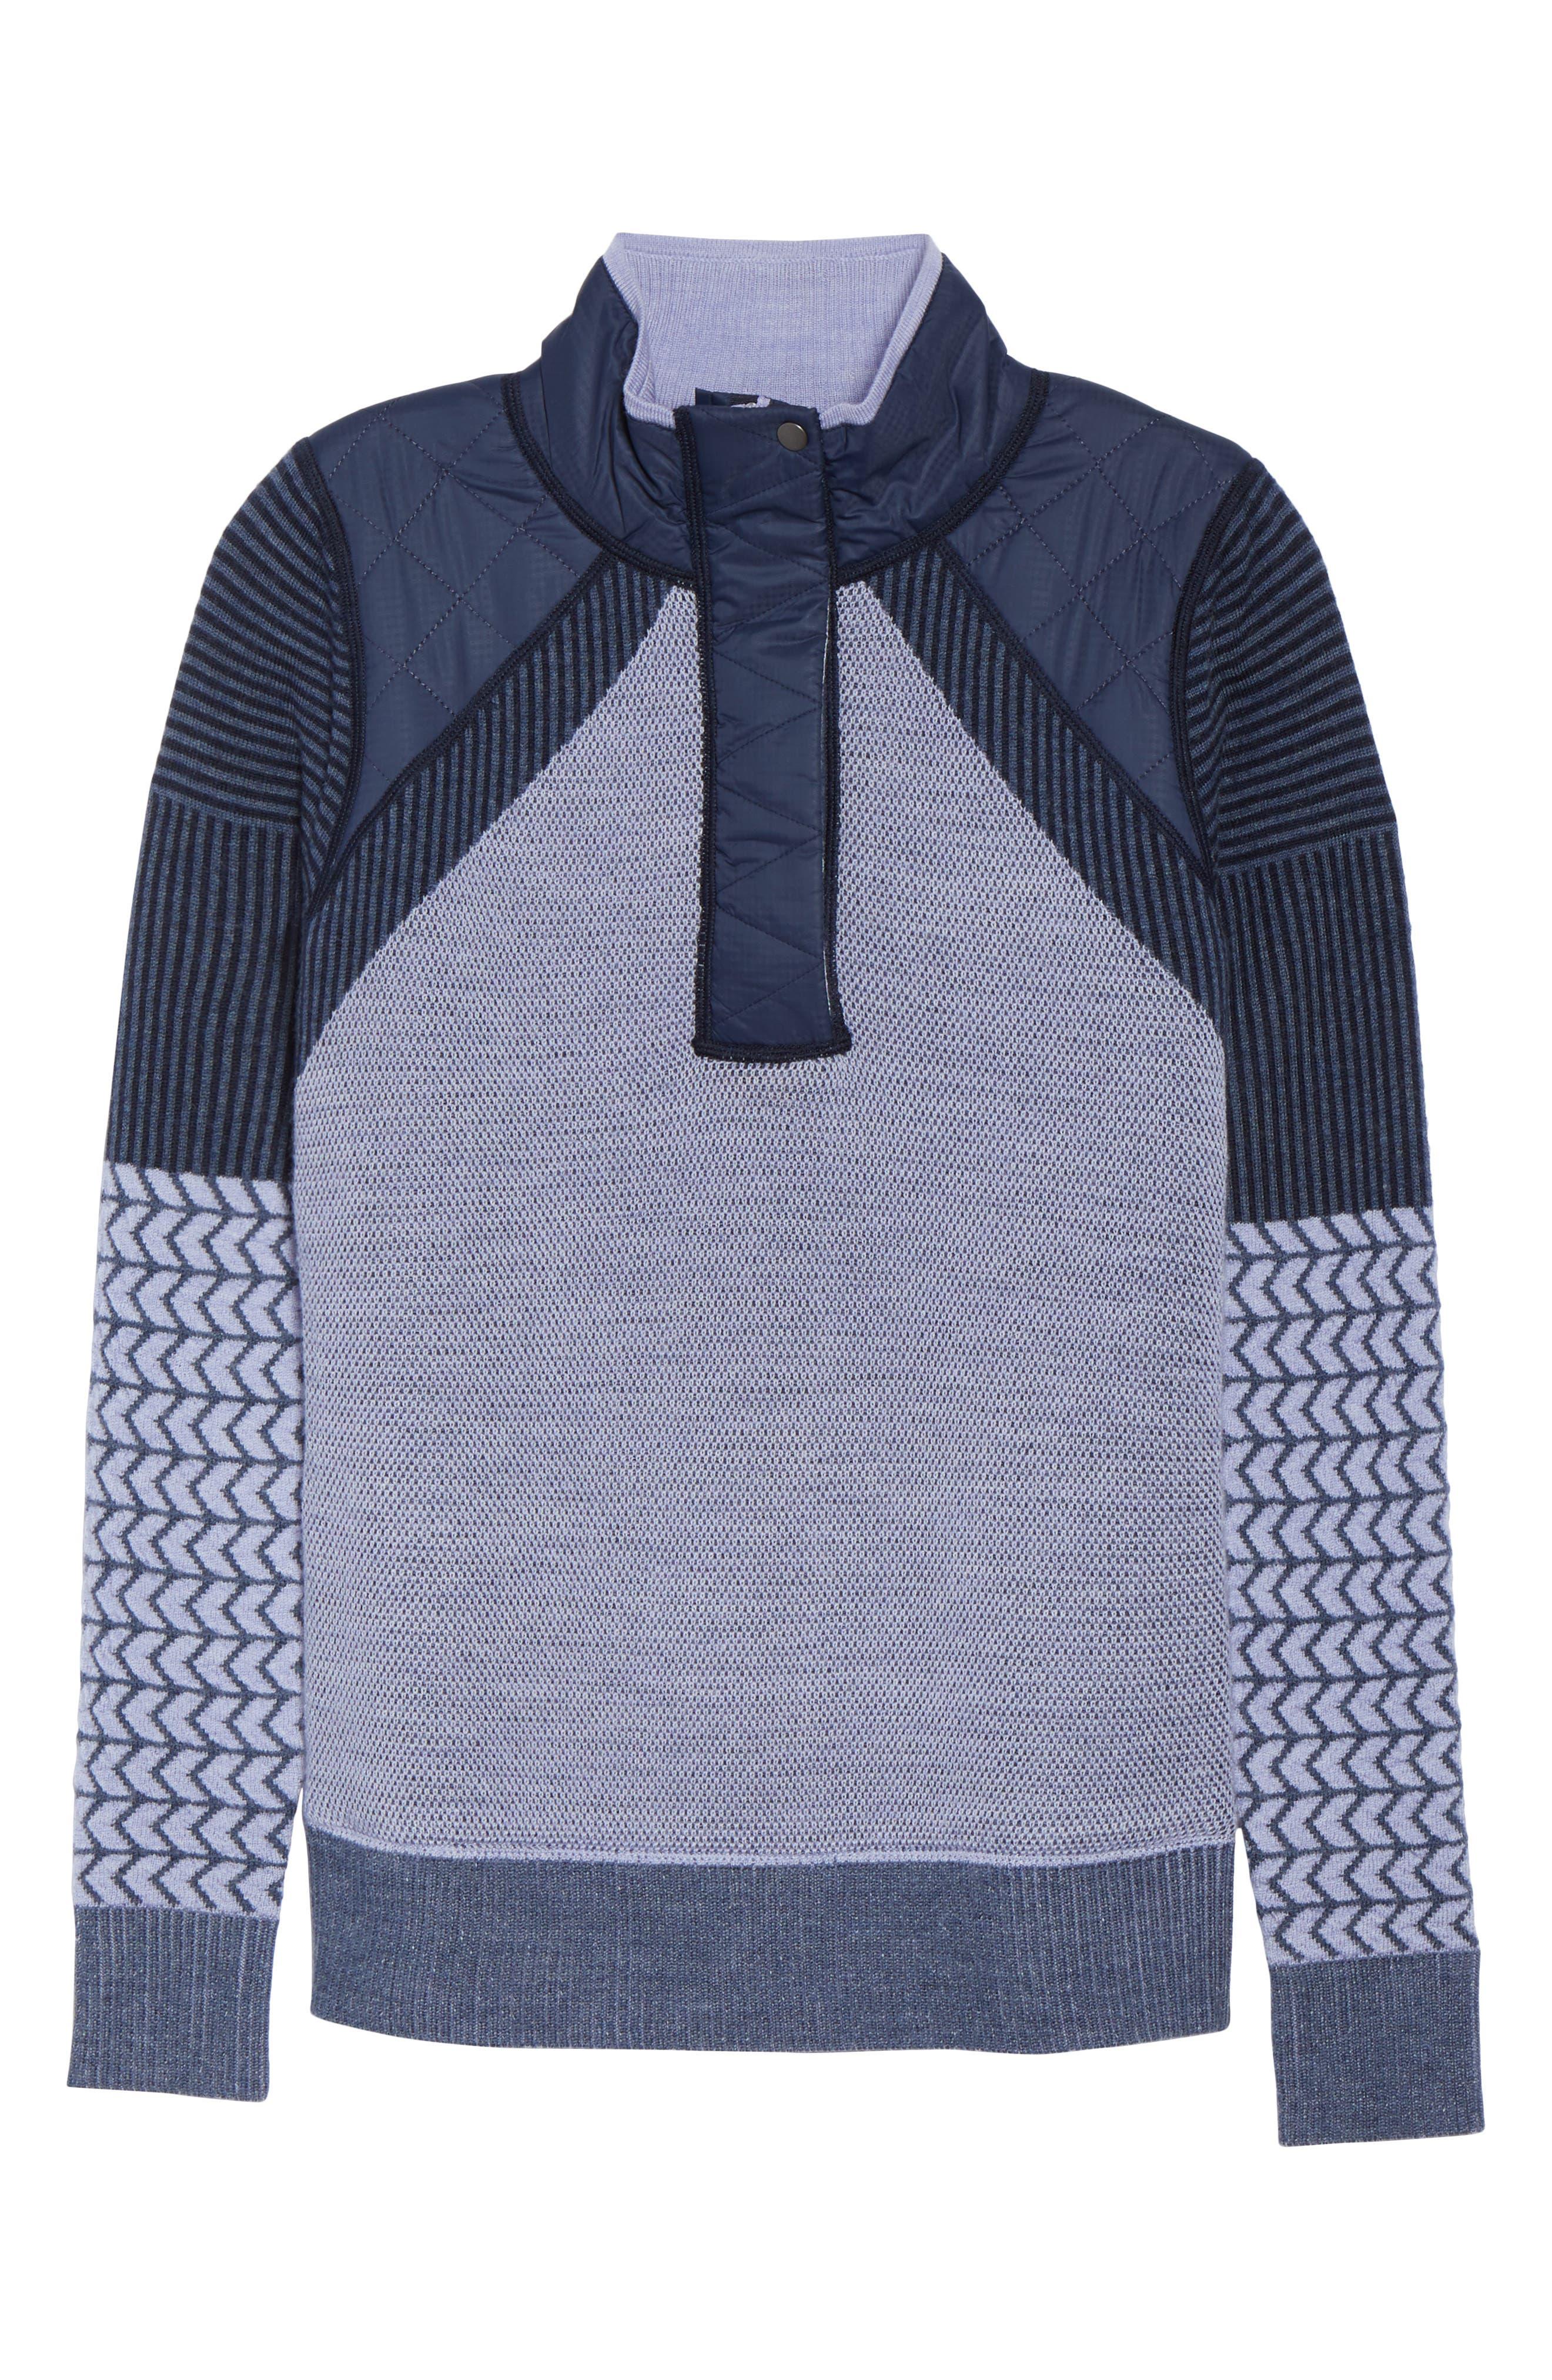 Ski Ninja Pullover Sweater,                             Alternate thumbnail 7, color,                             410